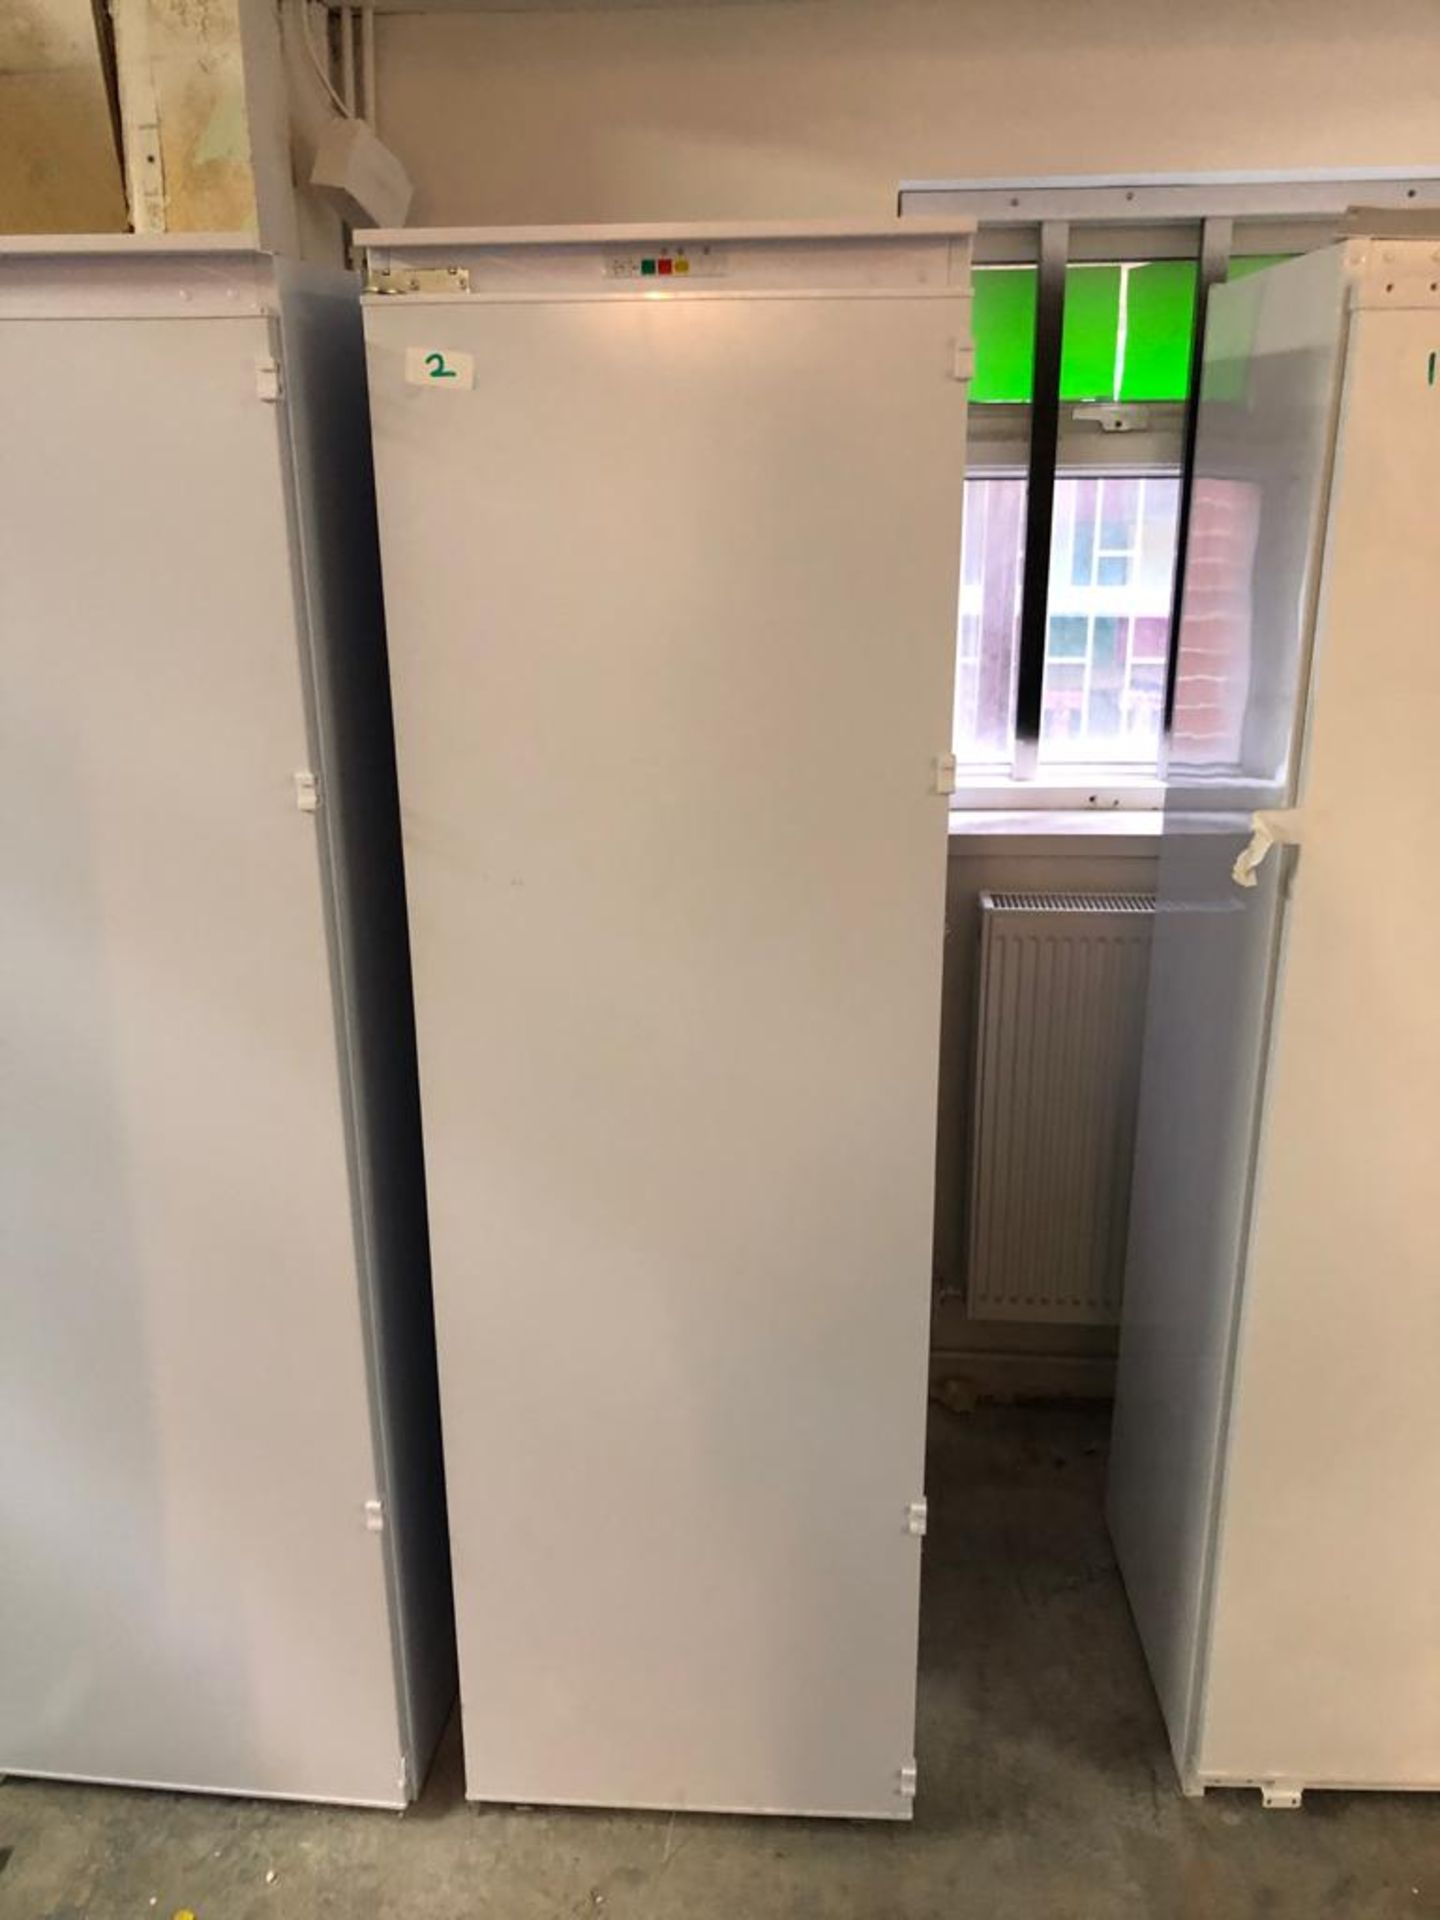 NEW/GRADED AND UNPACKAGED Prima Built-in Larder Freezer - PRRF209 (Slight damage to door/side)